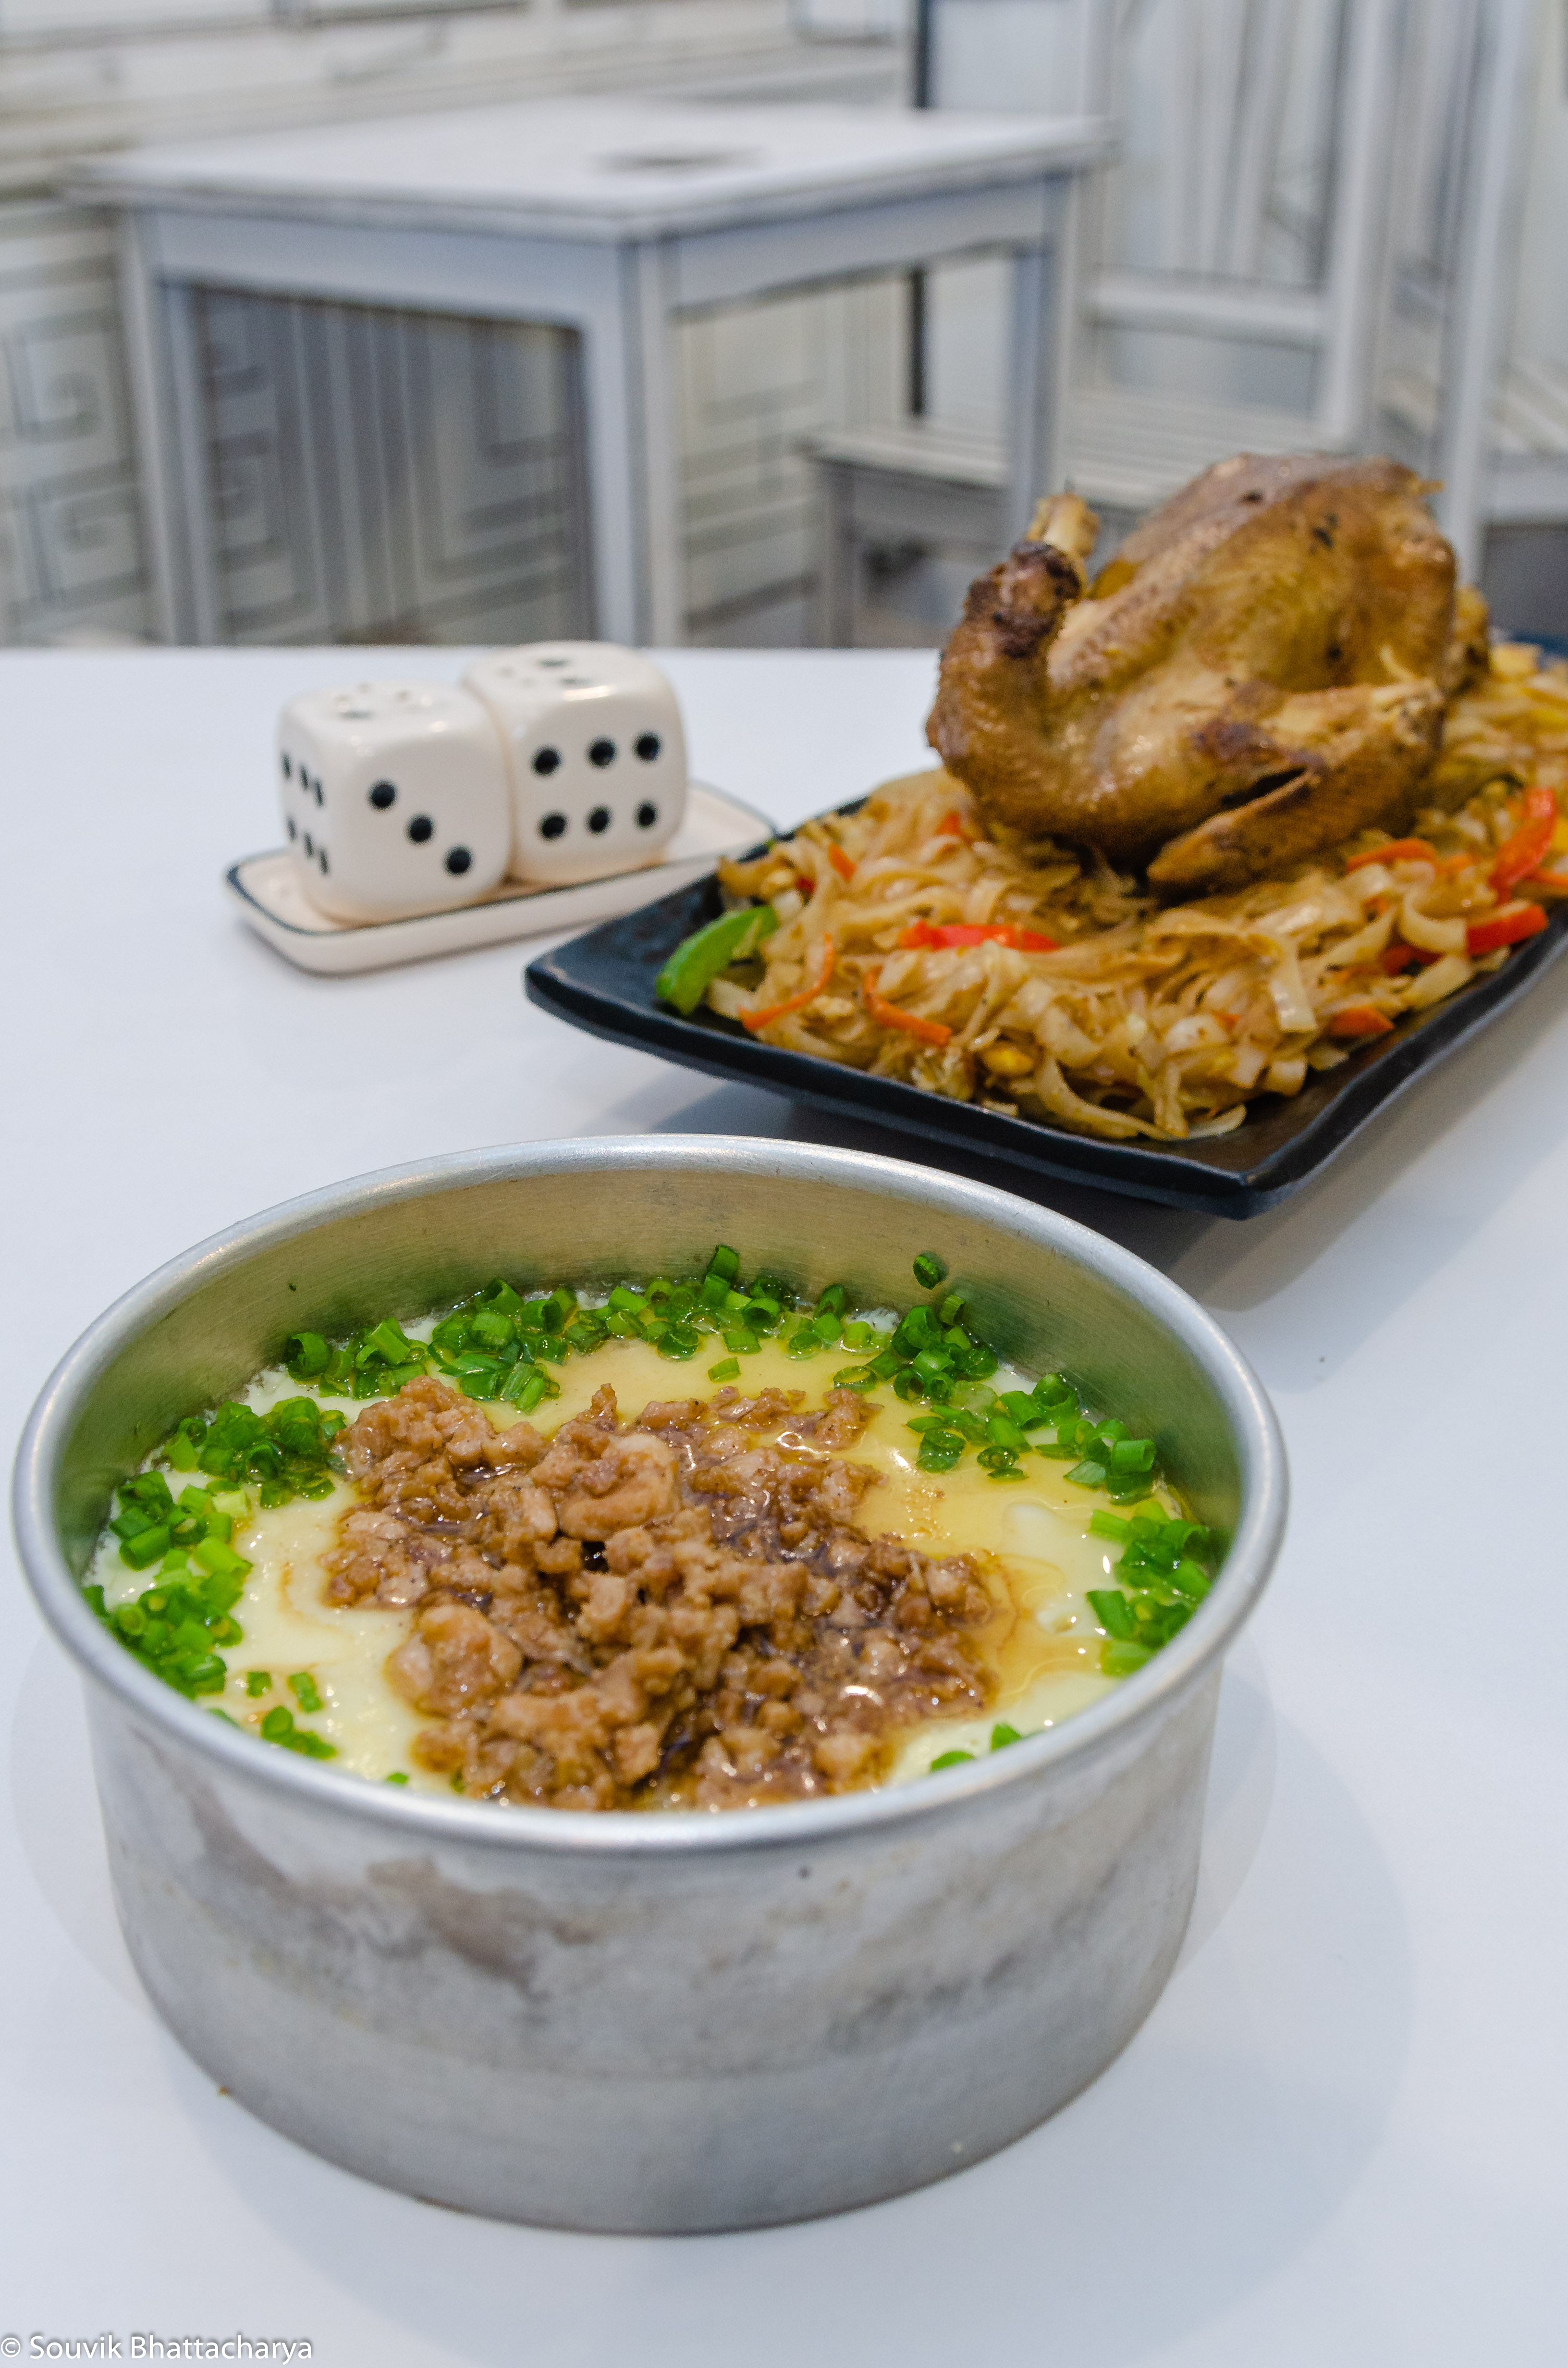 Winn's Magic Portion in Wokies two-dimensional restaurant